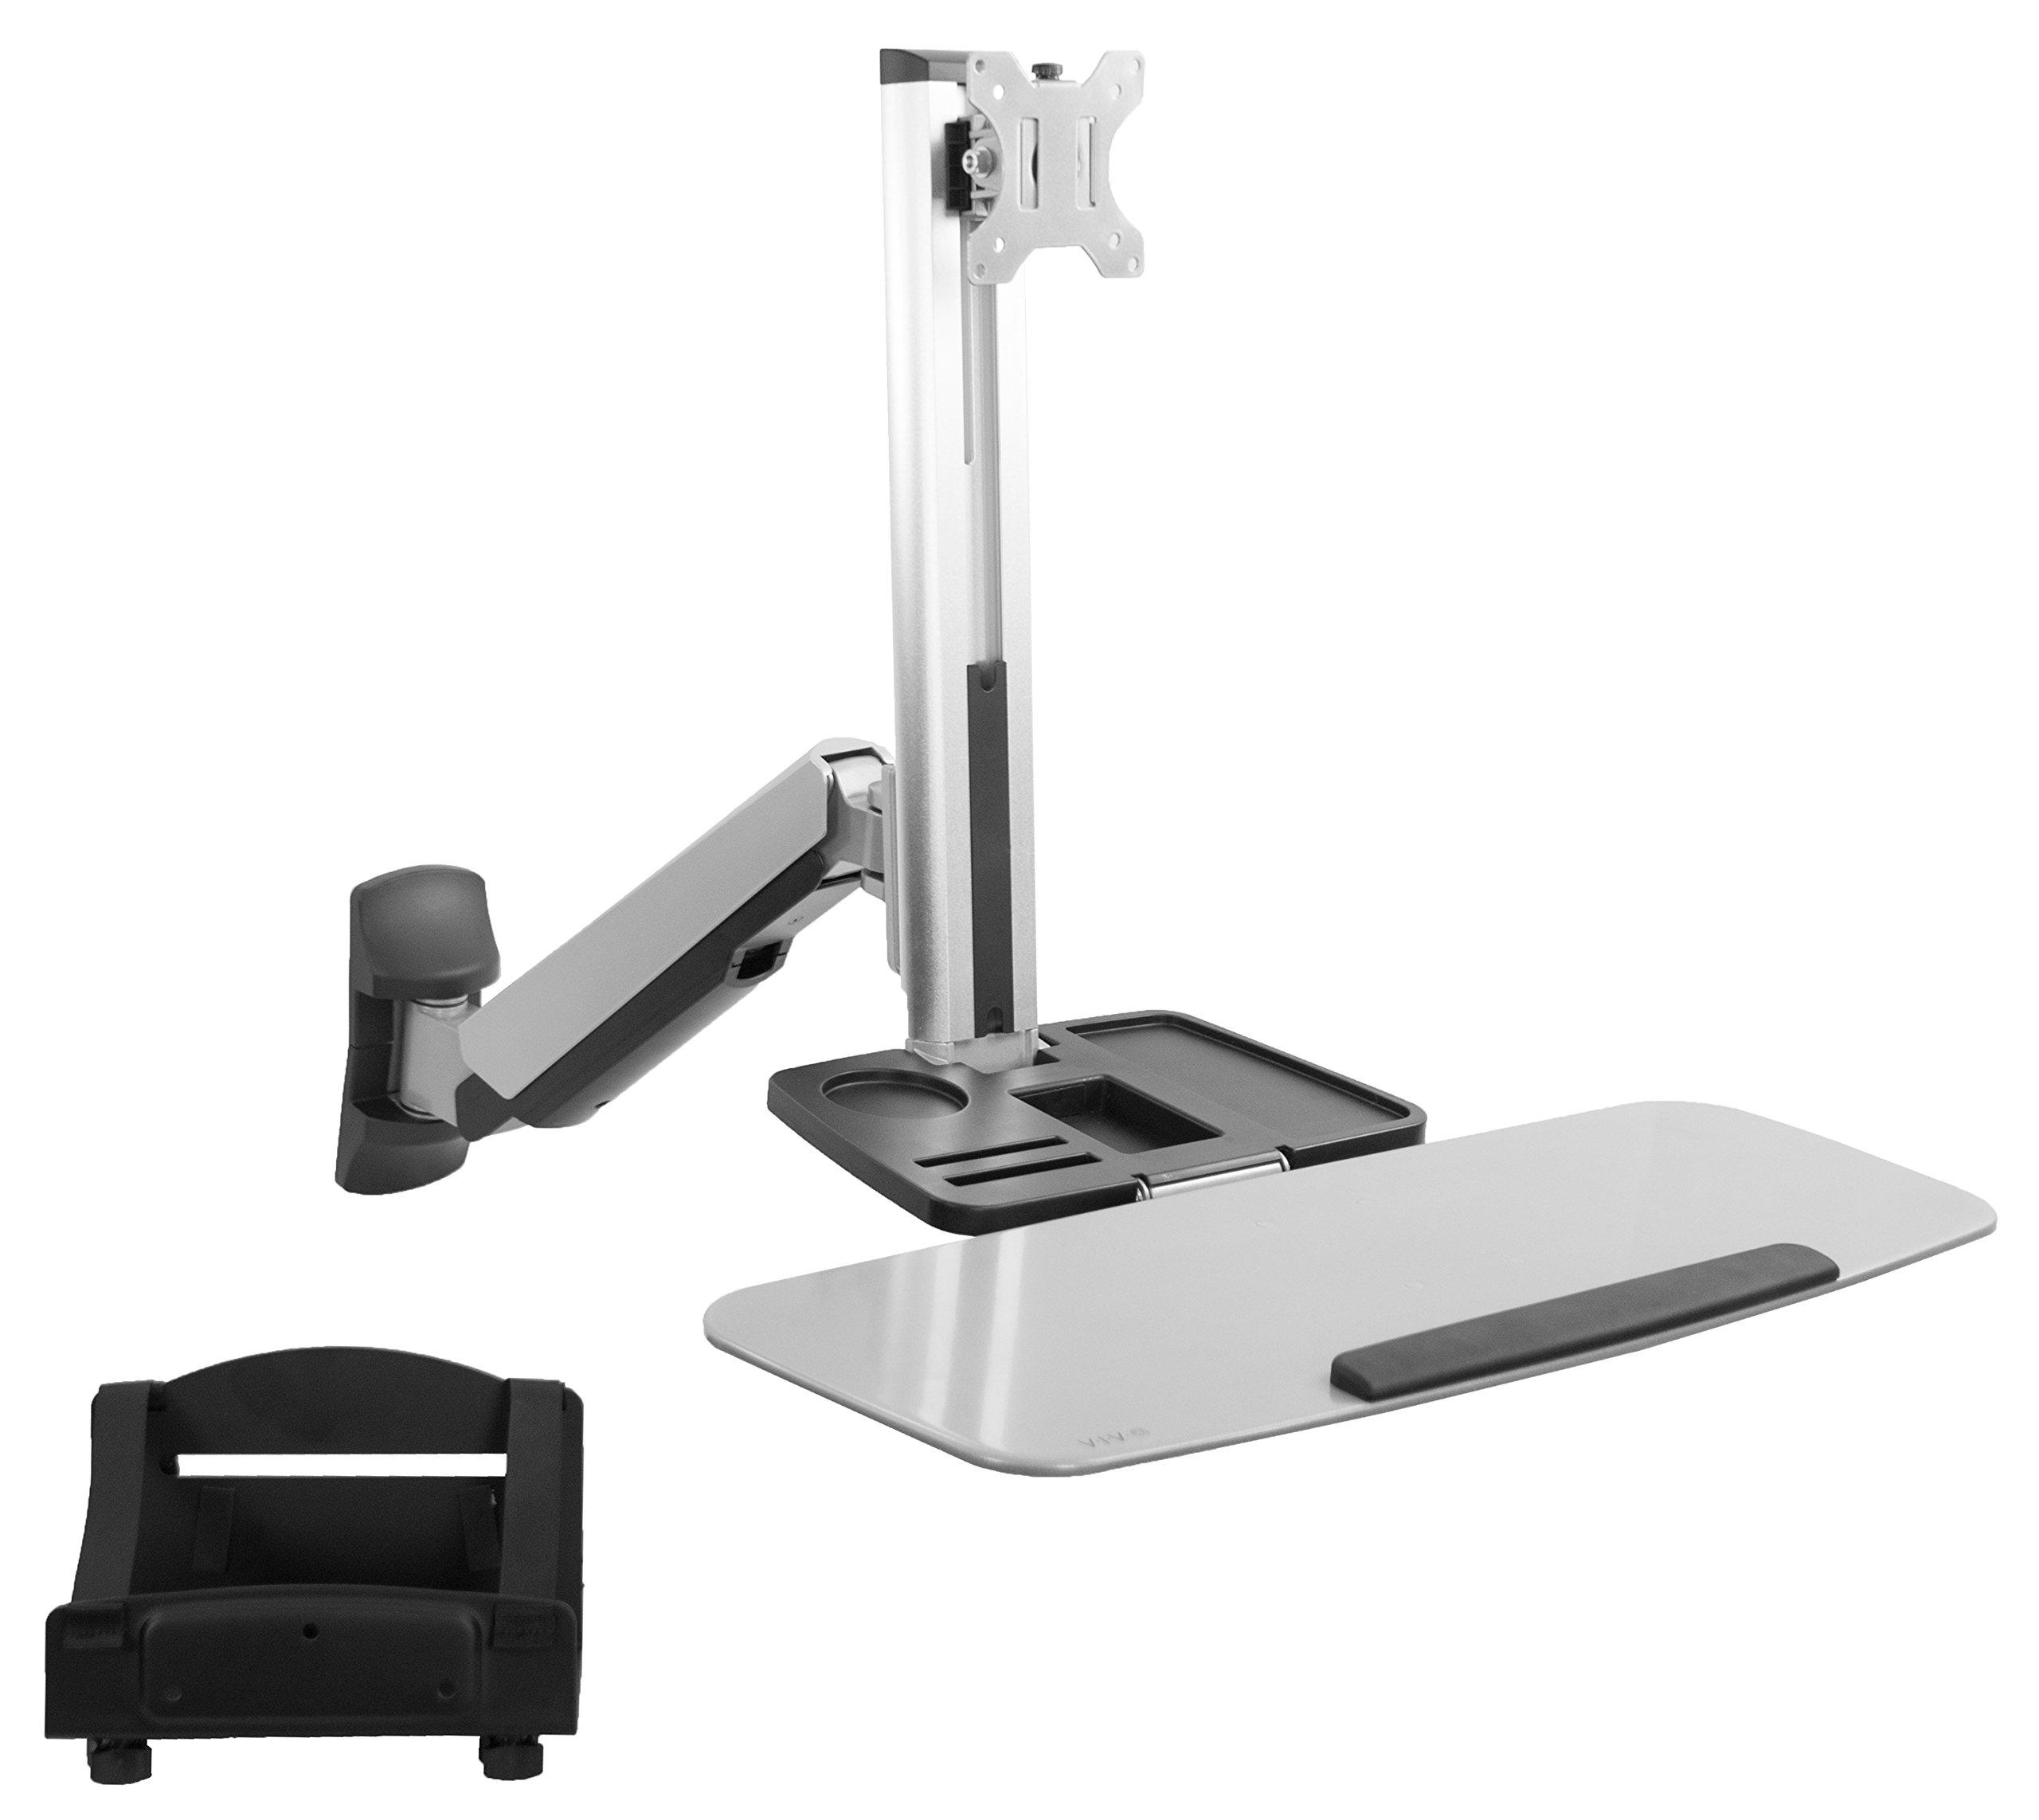 VIVO Single Monitor & Keyboard Counterbalance Sit-Stand Wall Mount | Ergonomic Standing Transition Workstation (STAND-SIT1W)